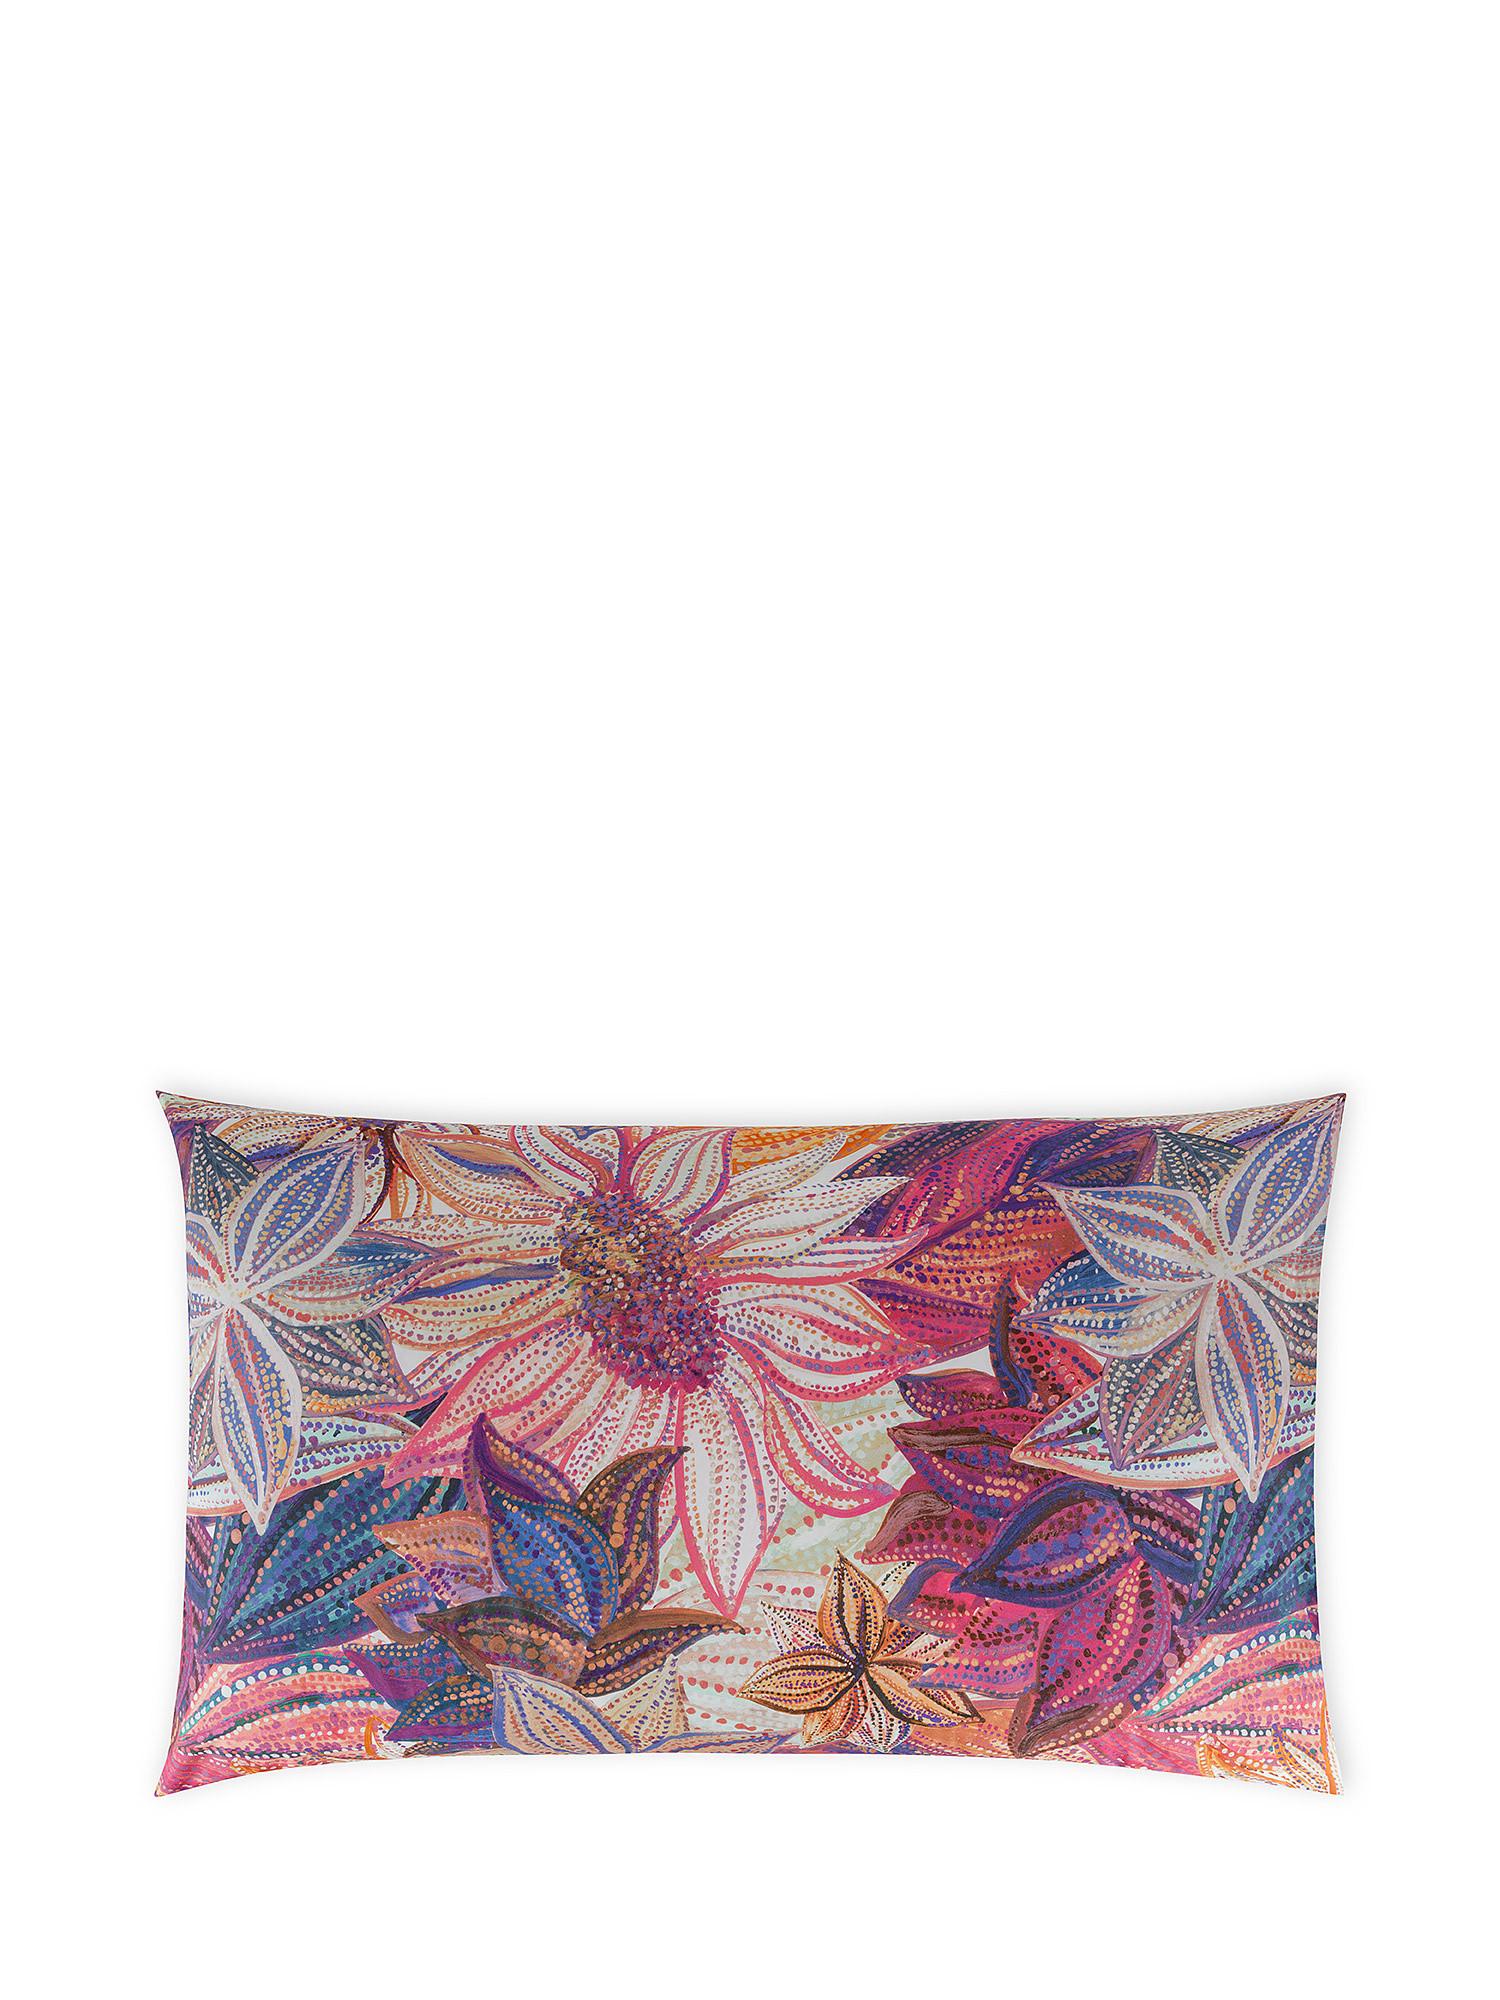 Federa cotone percalle fantasia floreale, Multicolor, large image number 0